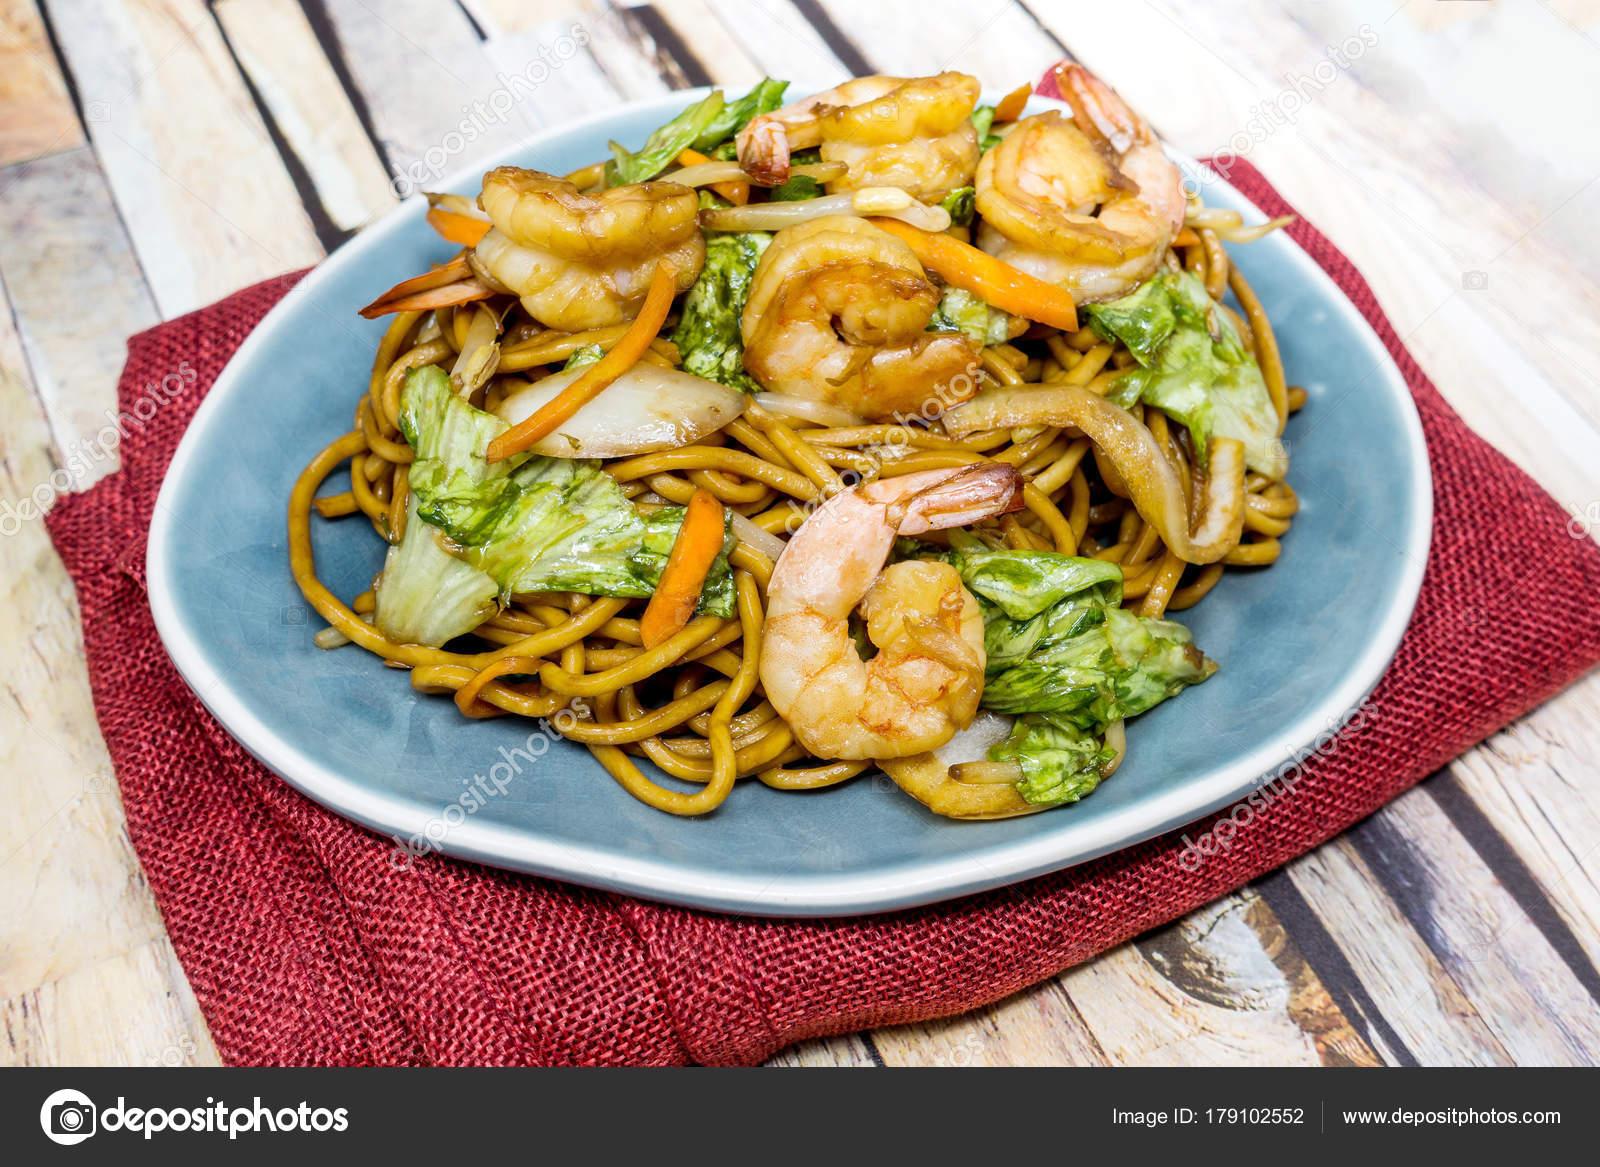 Kuchnia Azjatycka Smażone Krewetki Makaron Na Stole